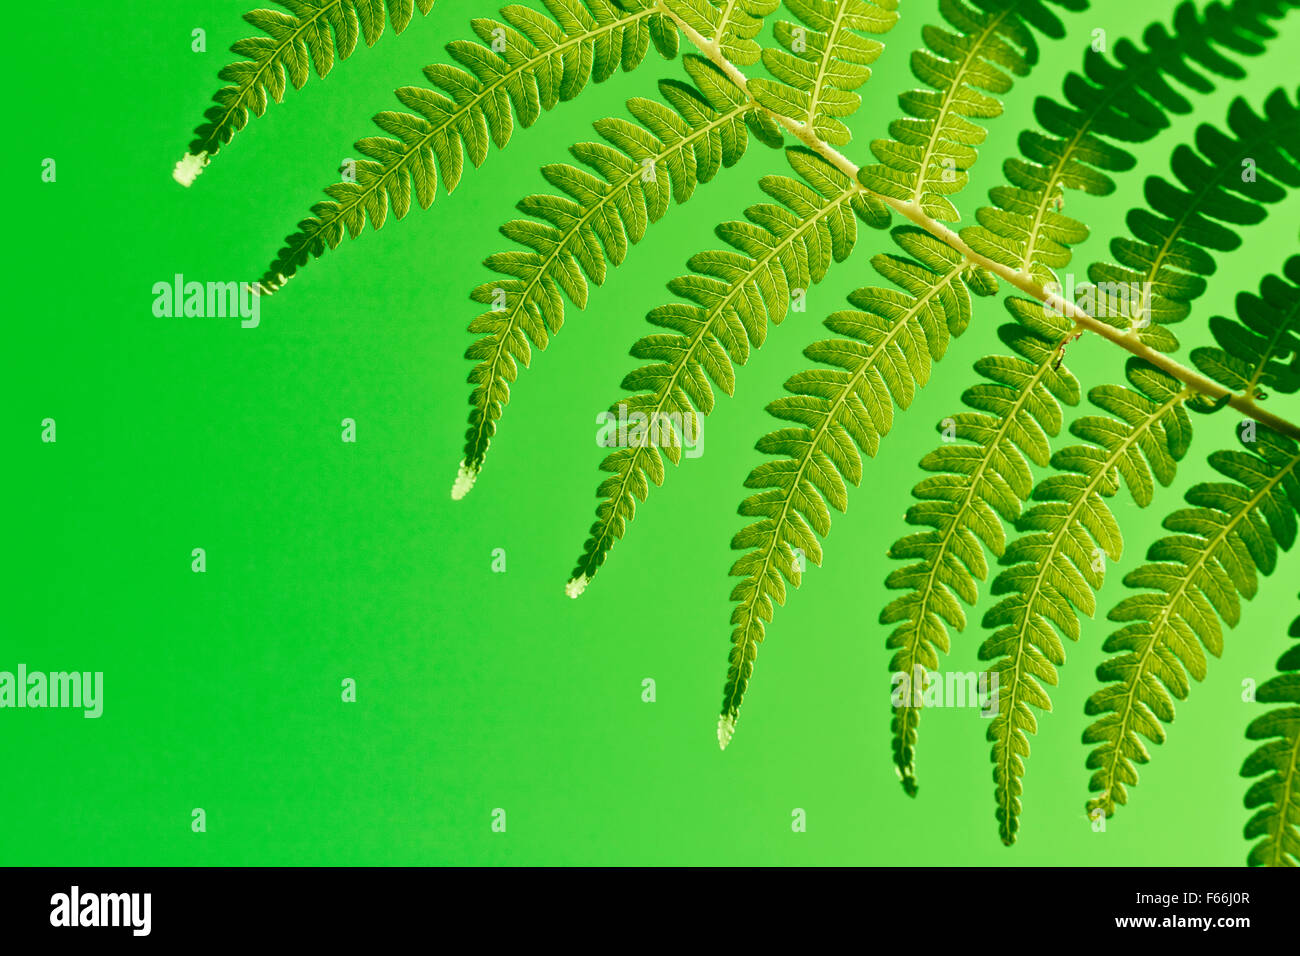 Frische grüne Neuseeland Farn Hintergründe Stockbild